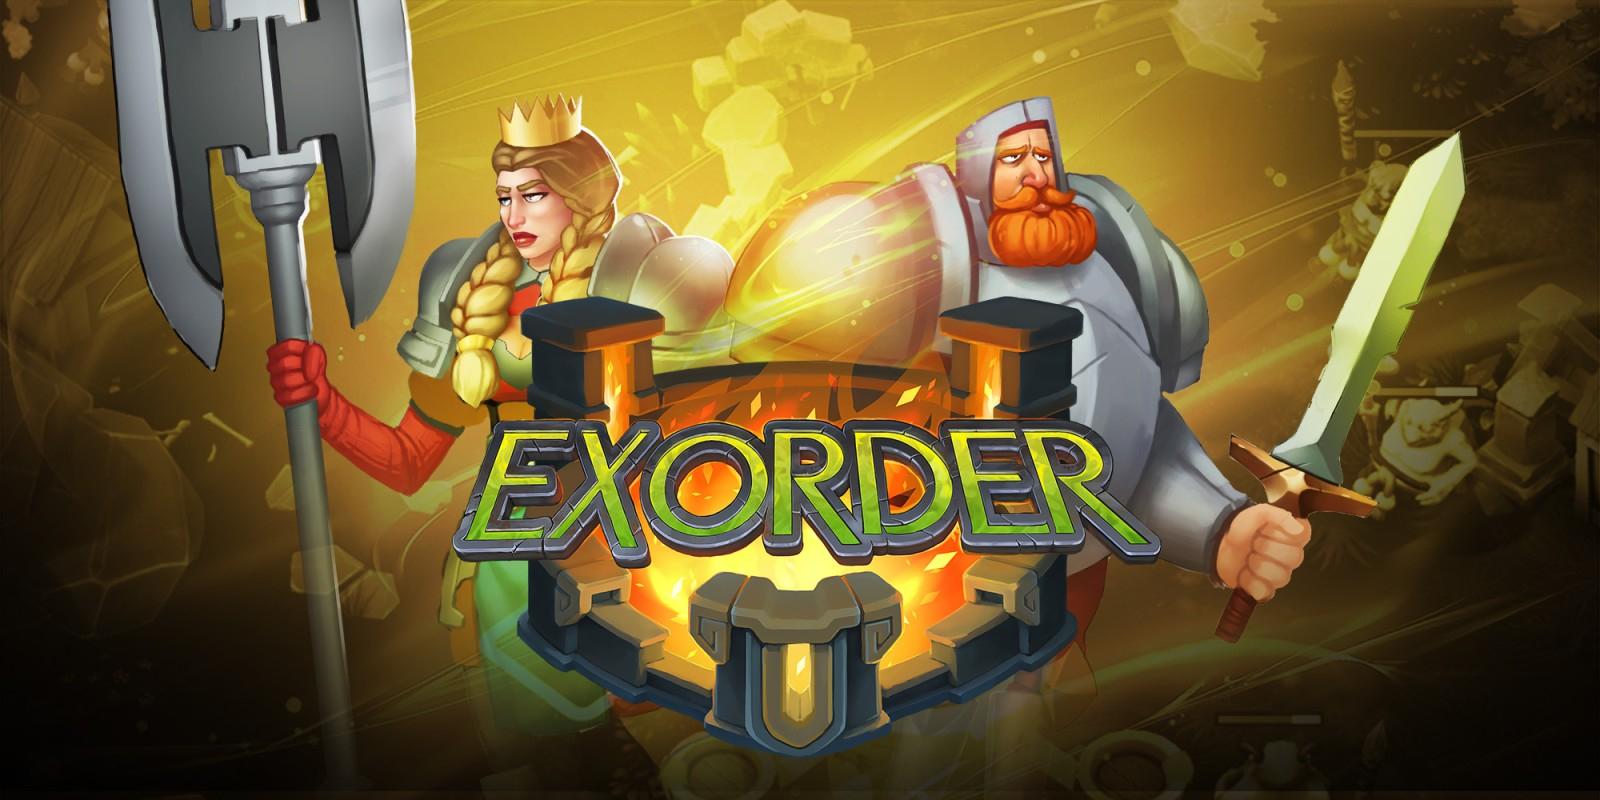 Exorder  - Nintendo Switch eShop